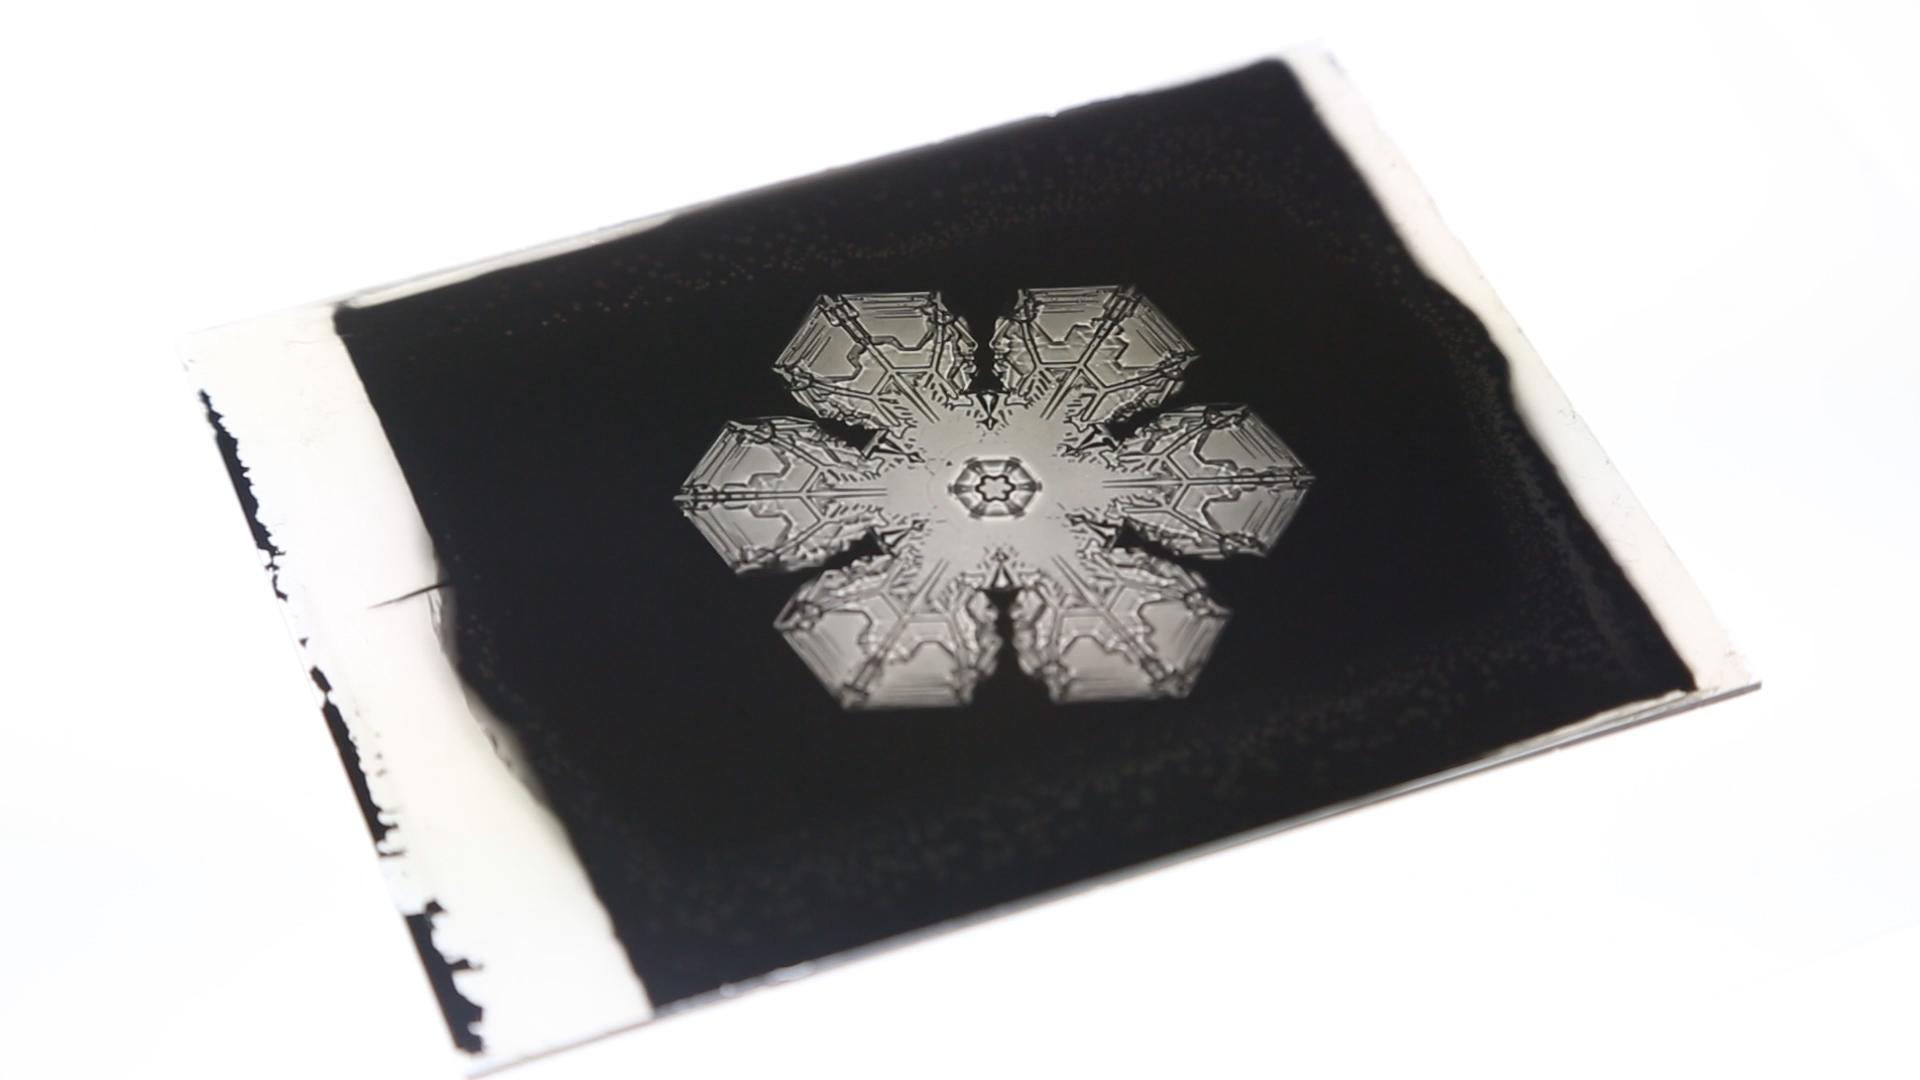 William Bentley S Photographs Of Snowflakes Idaho Statesman